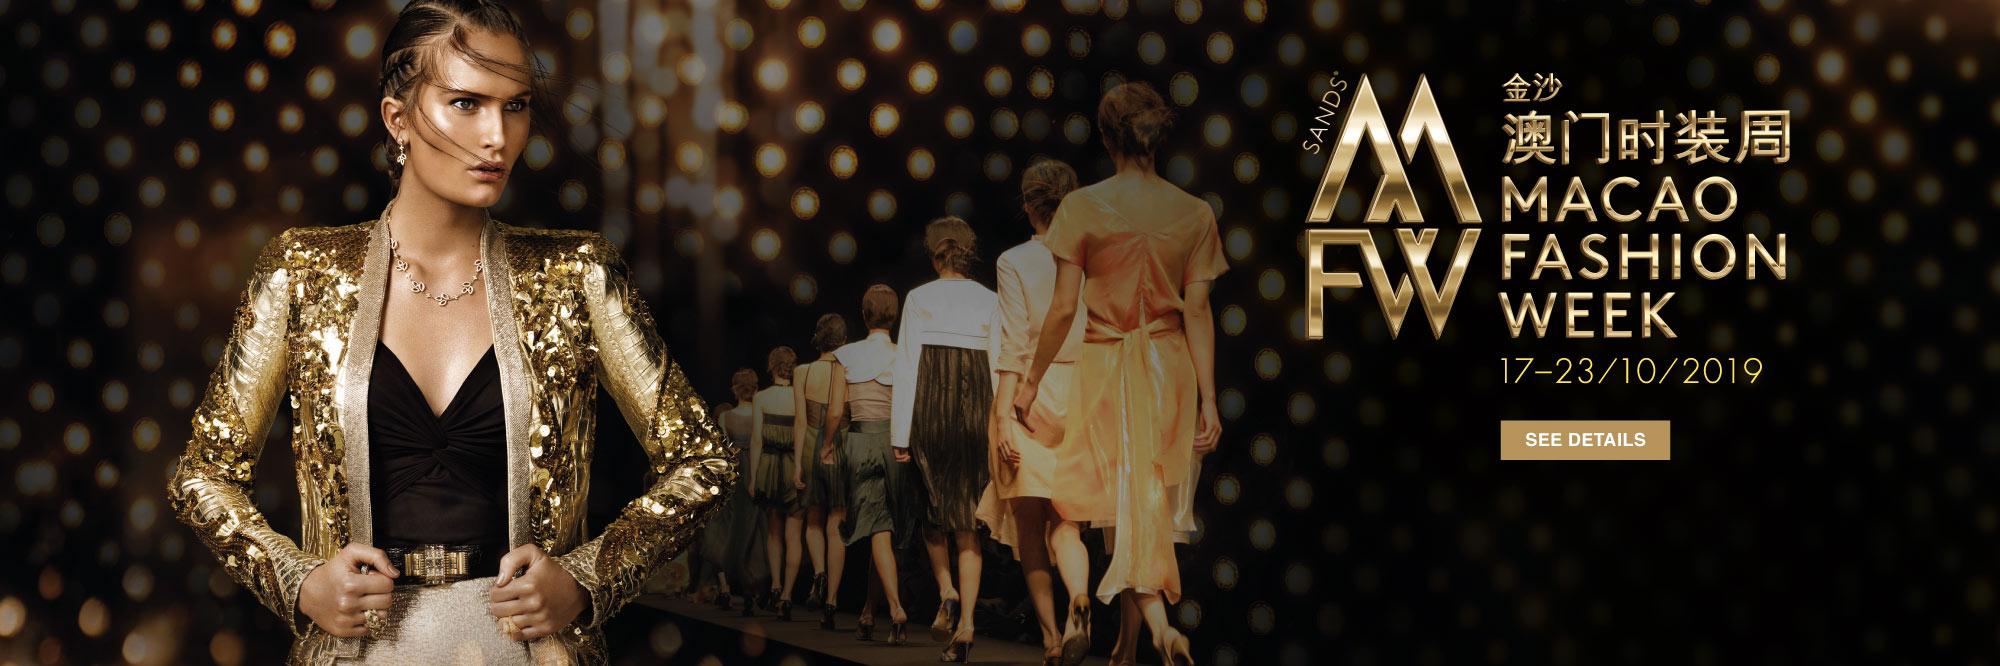 Macao Fashion Week